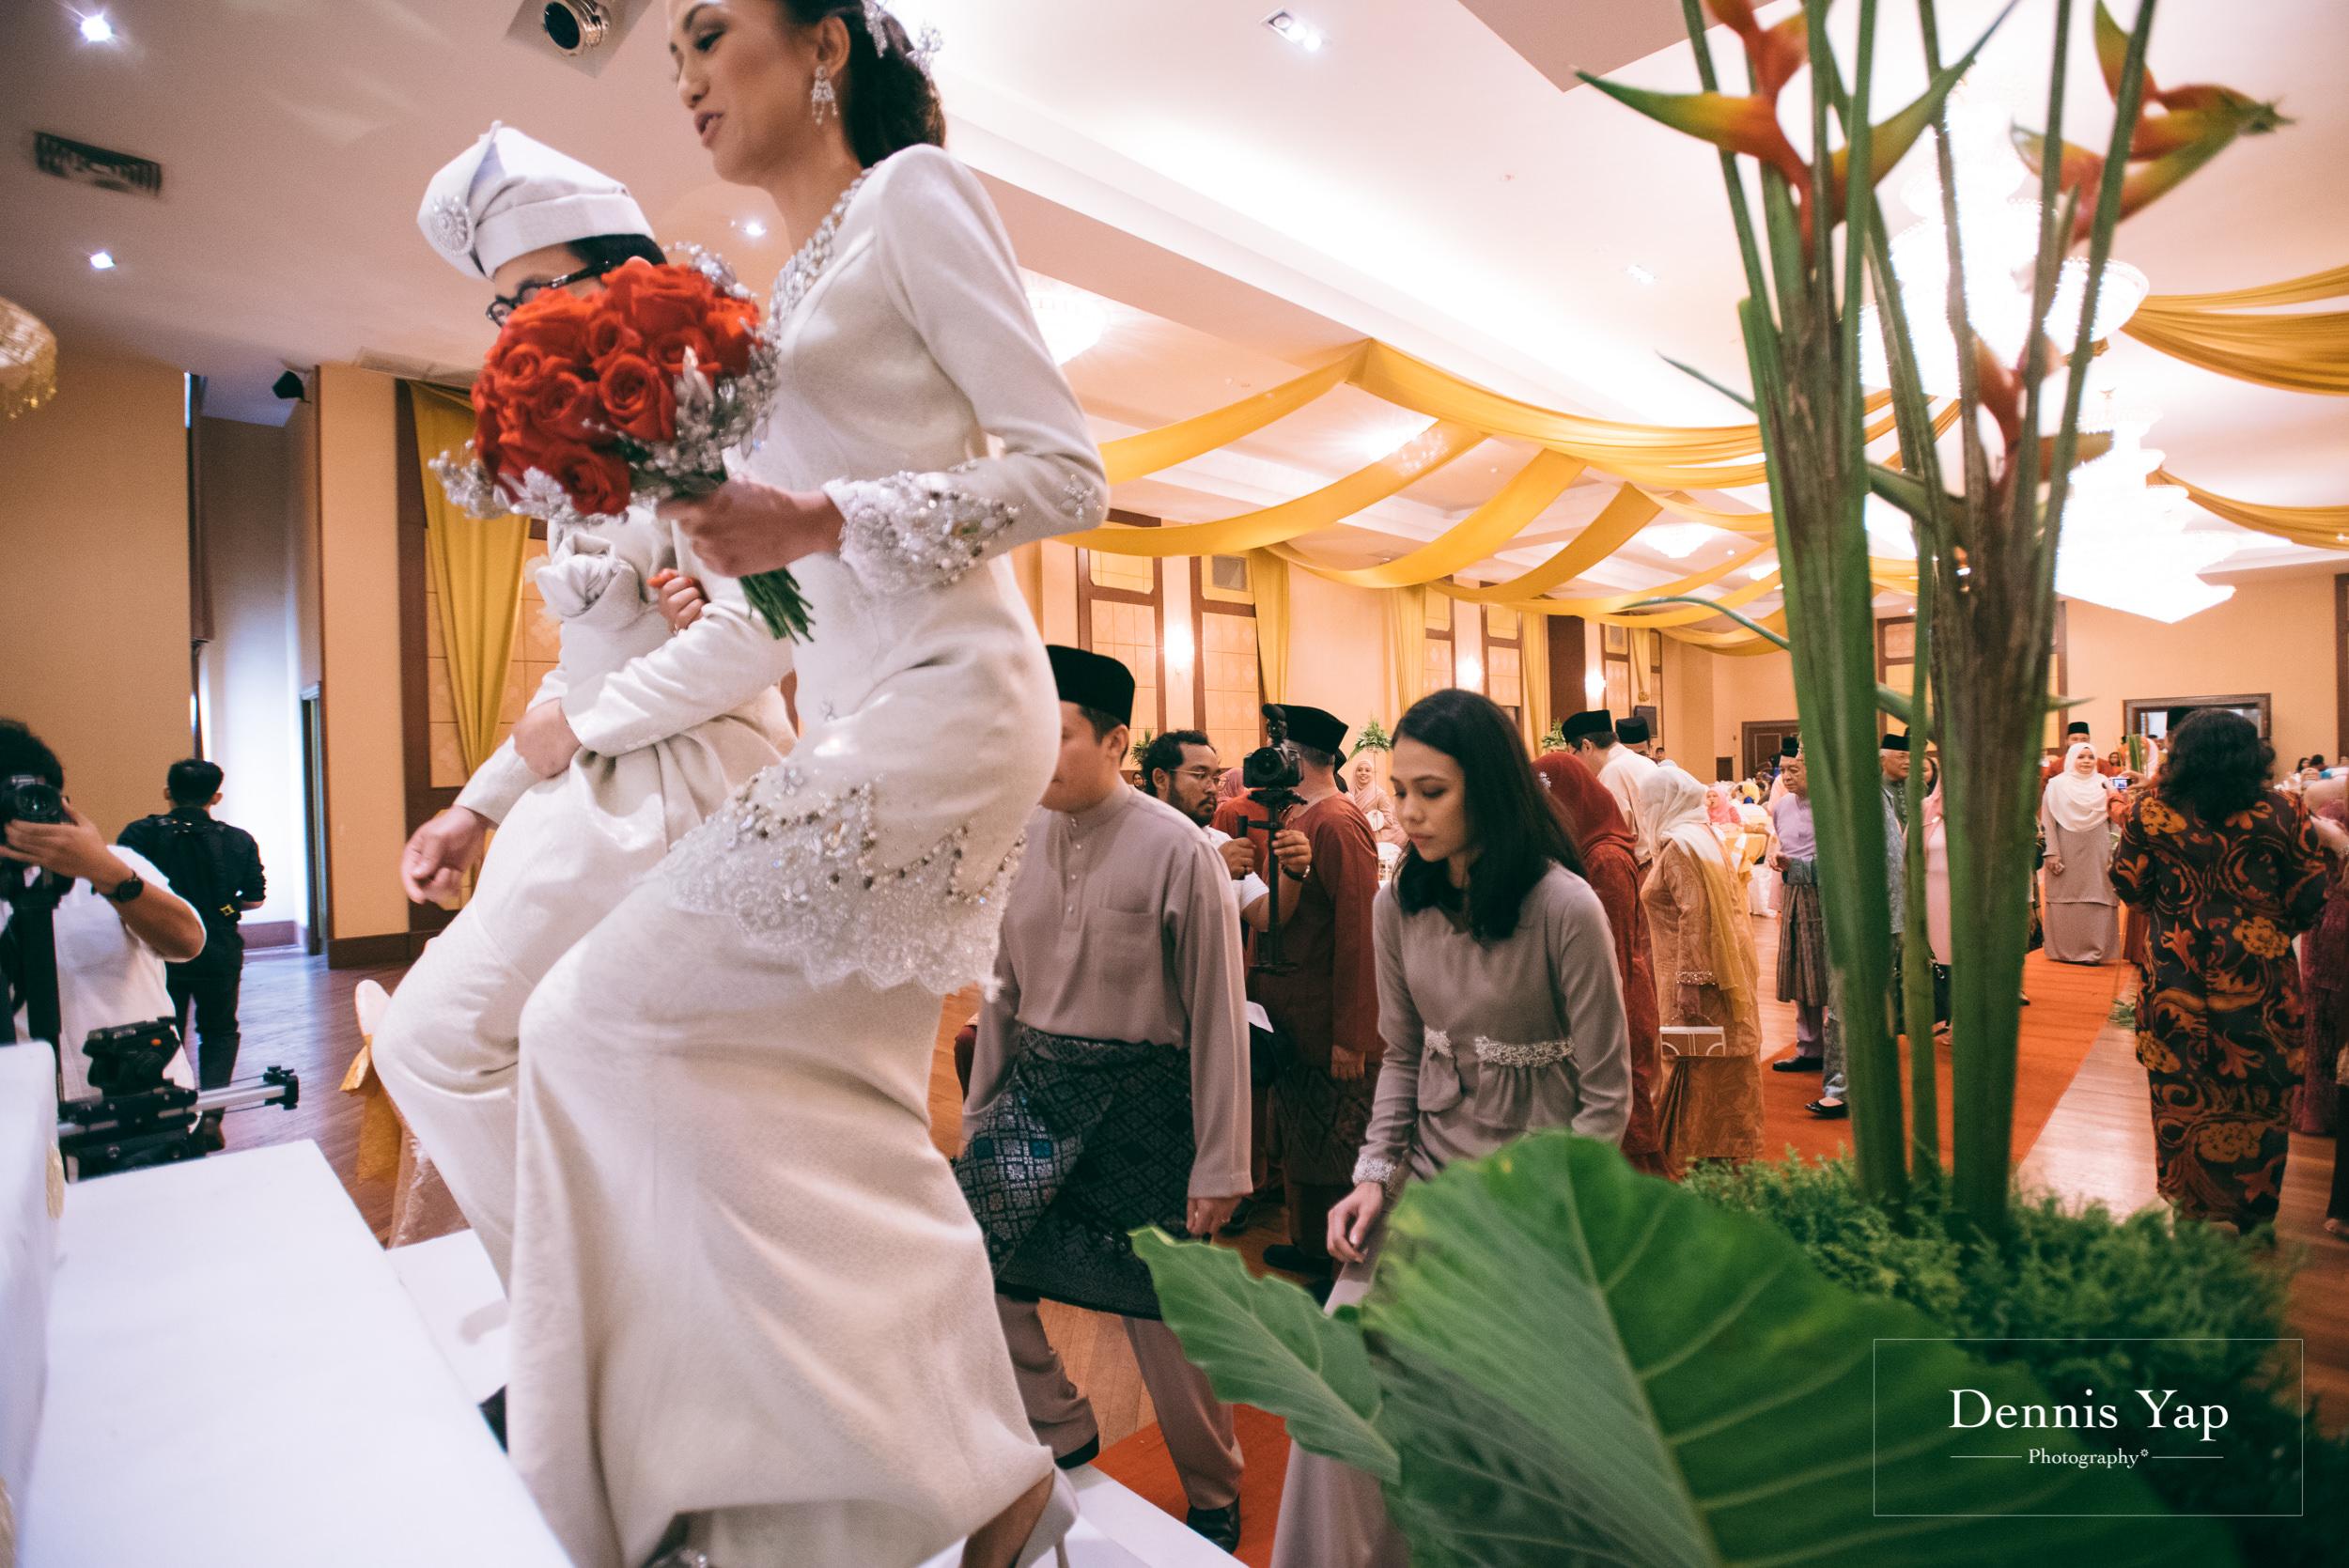 zarif hanalili malay wedding blessing ceremony dennis yap photography-12.jpg